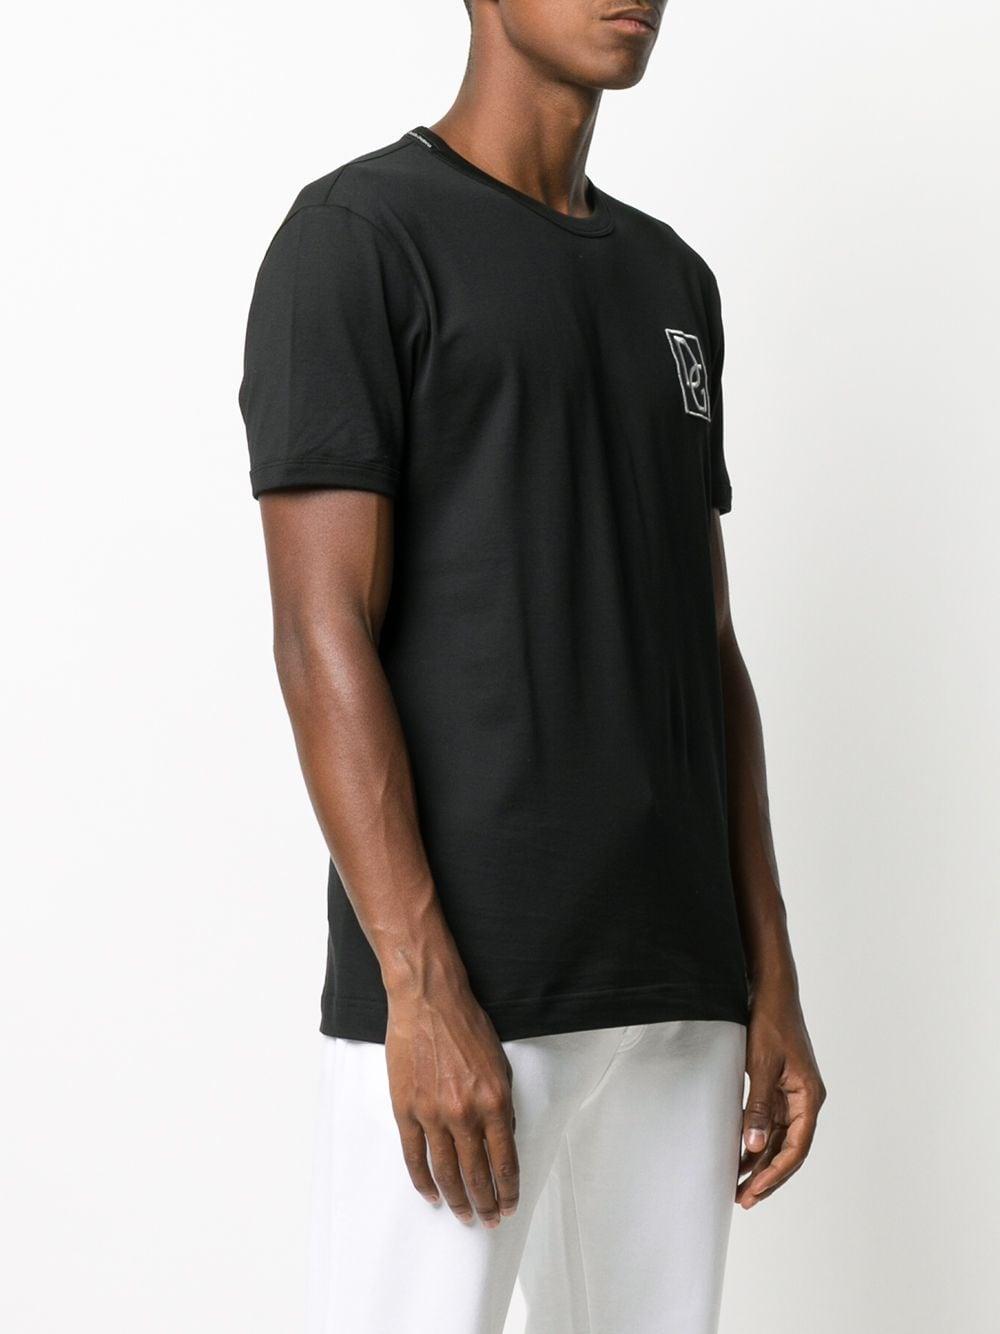 jersey cotton black t.shirt with front D&G logo DOLCE & GABBANA |  | G8JX7Z-G7XEPN0000